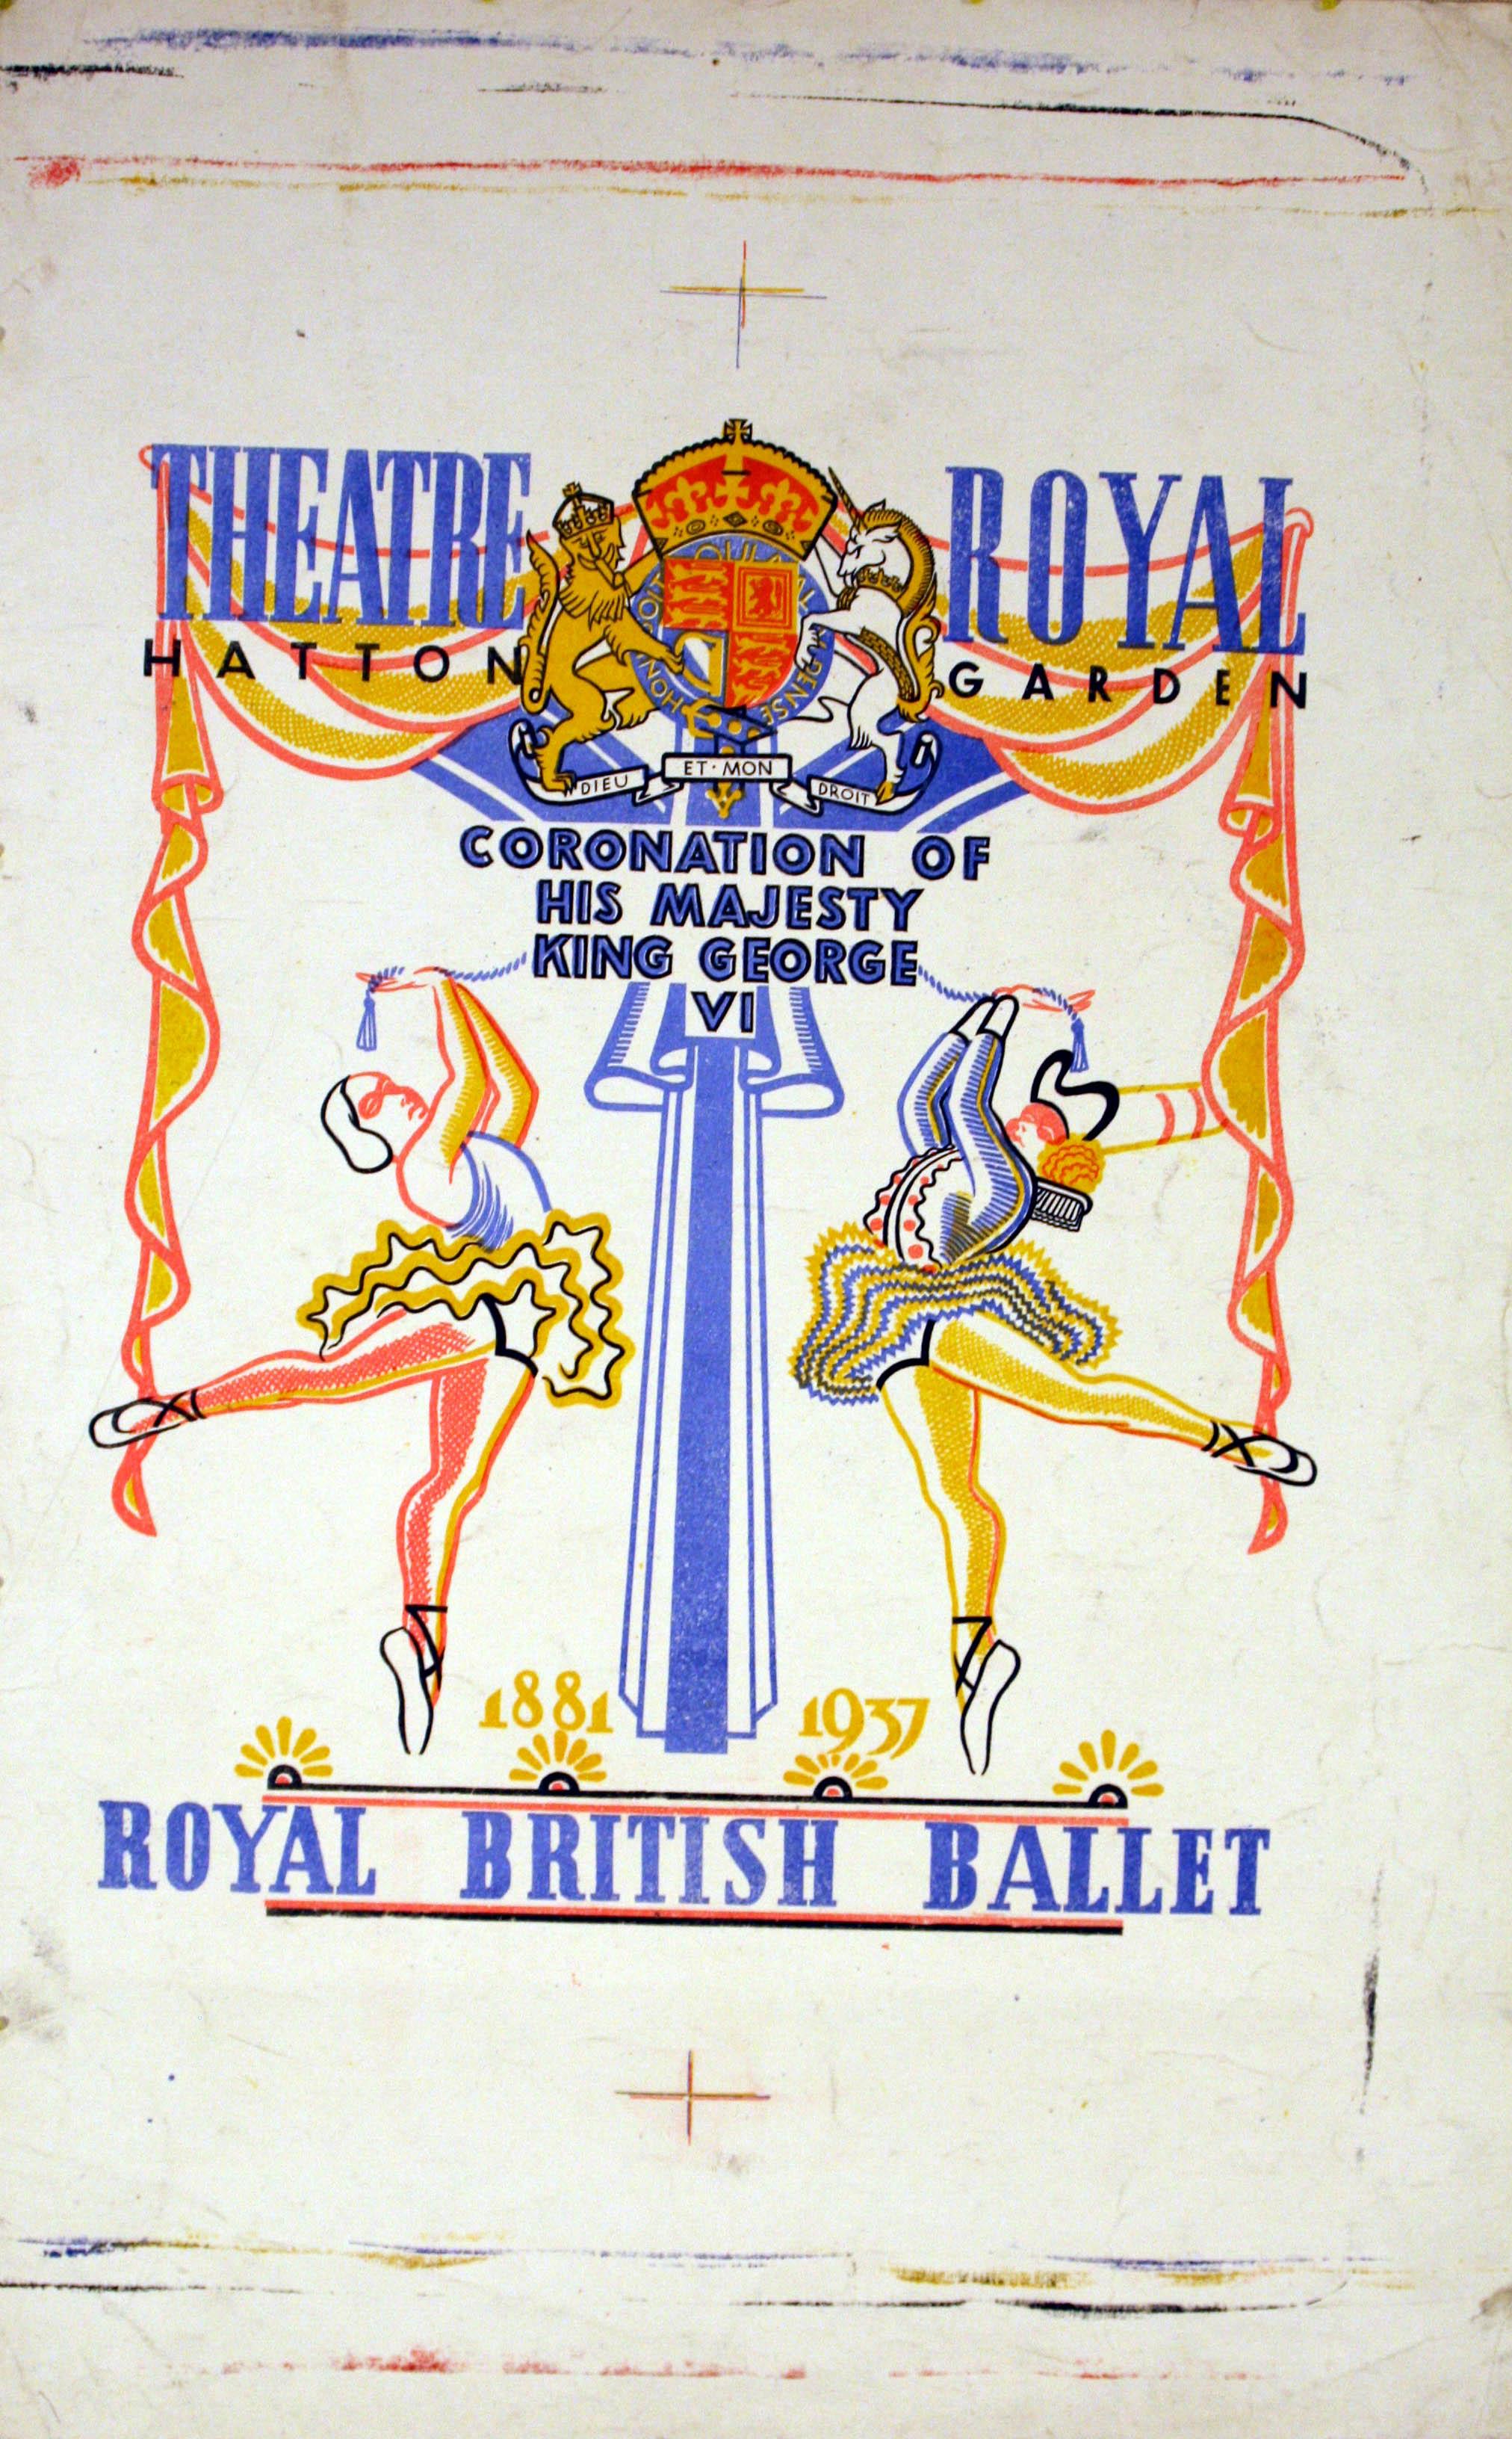 Advertising Poster Royal British Ballet 1937 Coronation